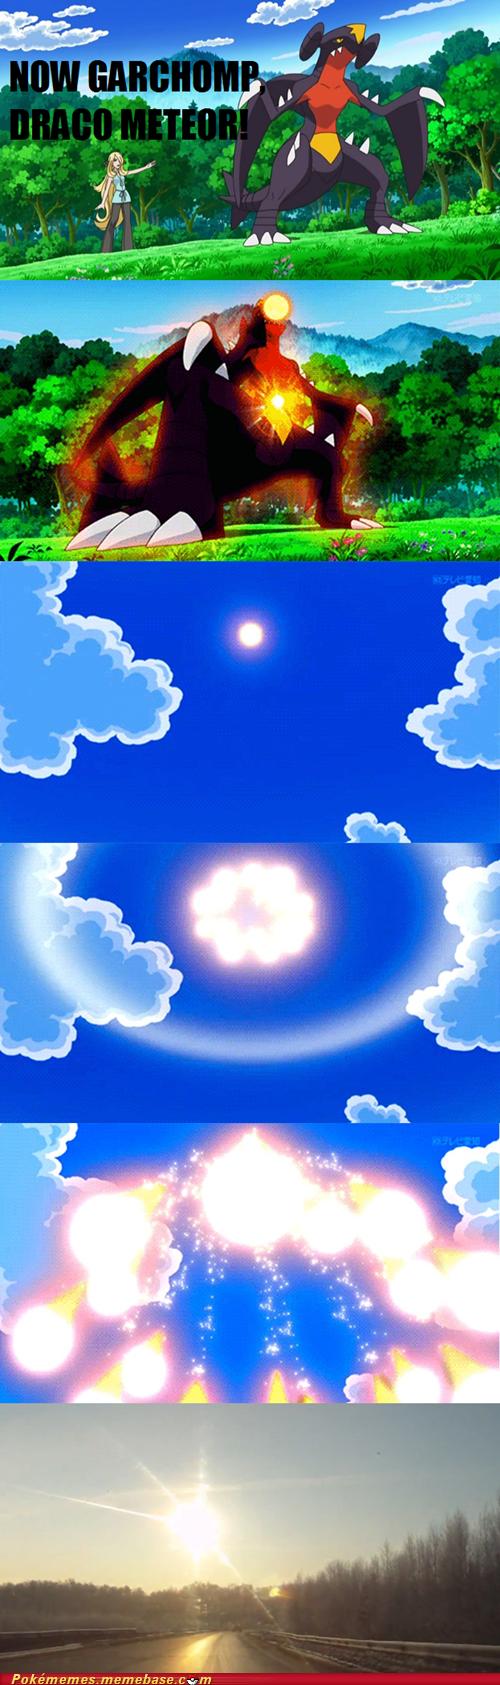 Garchomp used Draco Meteor